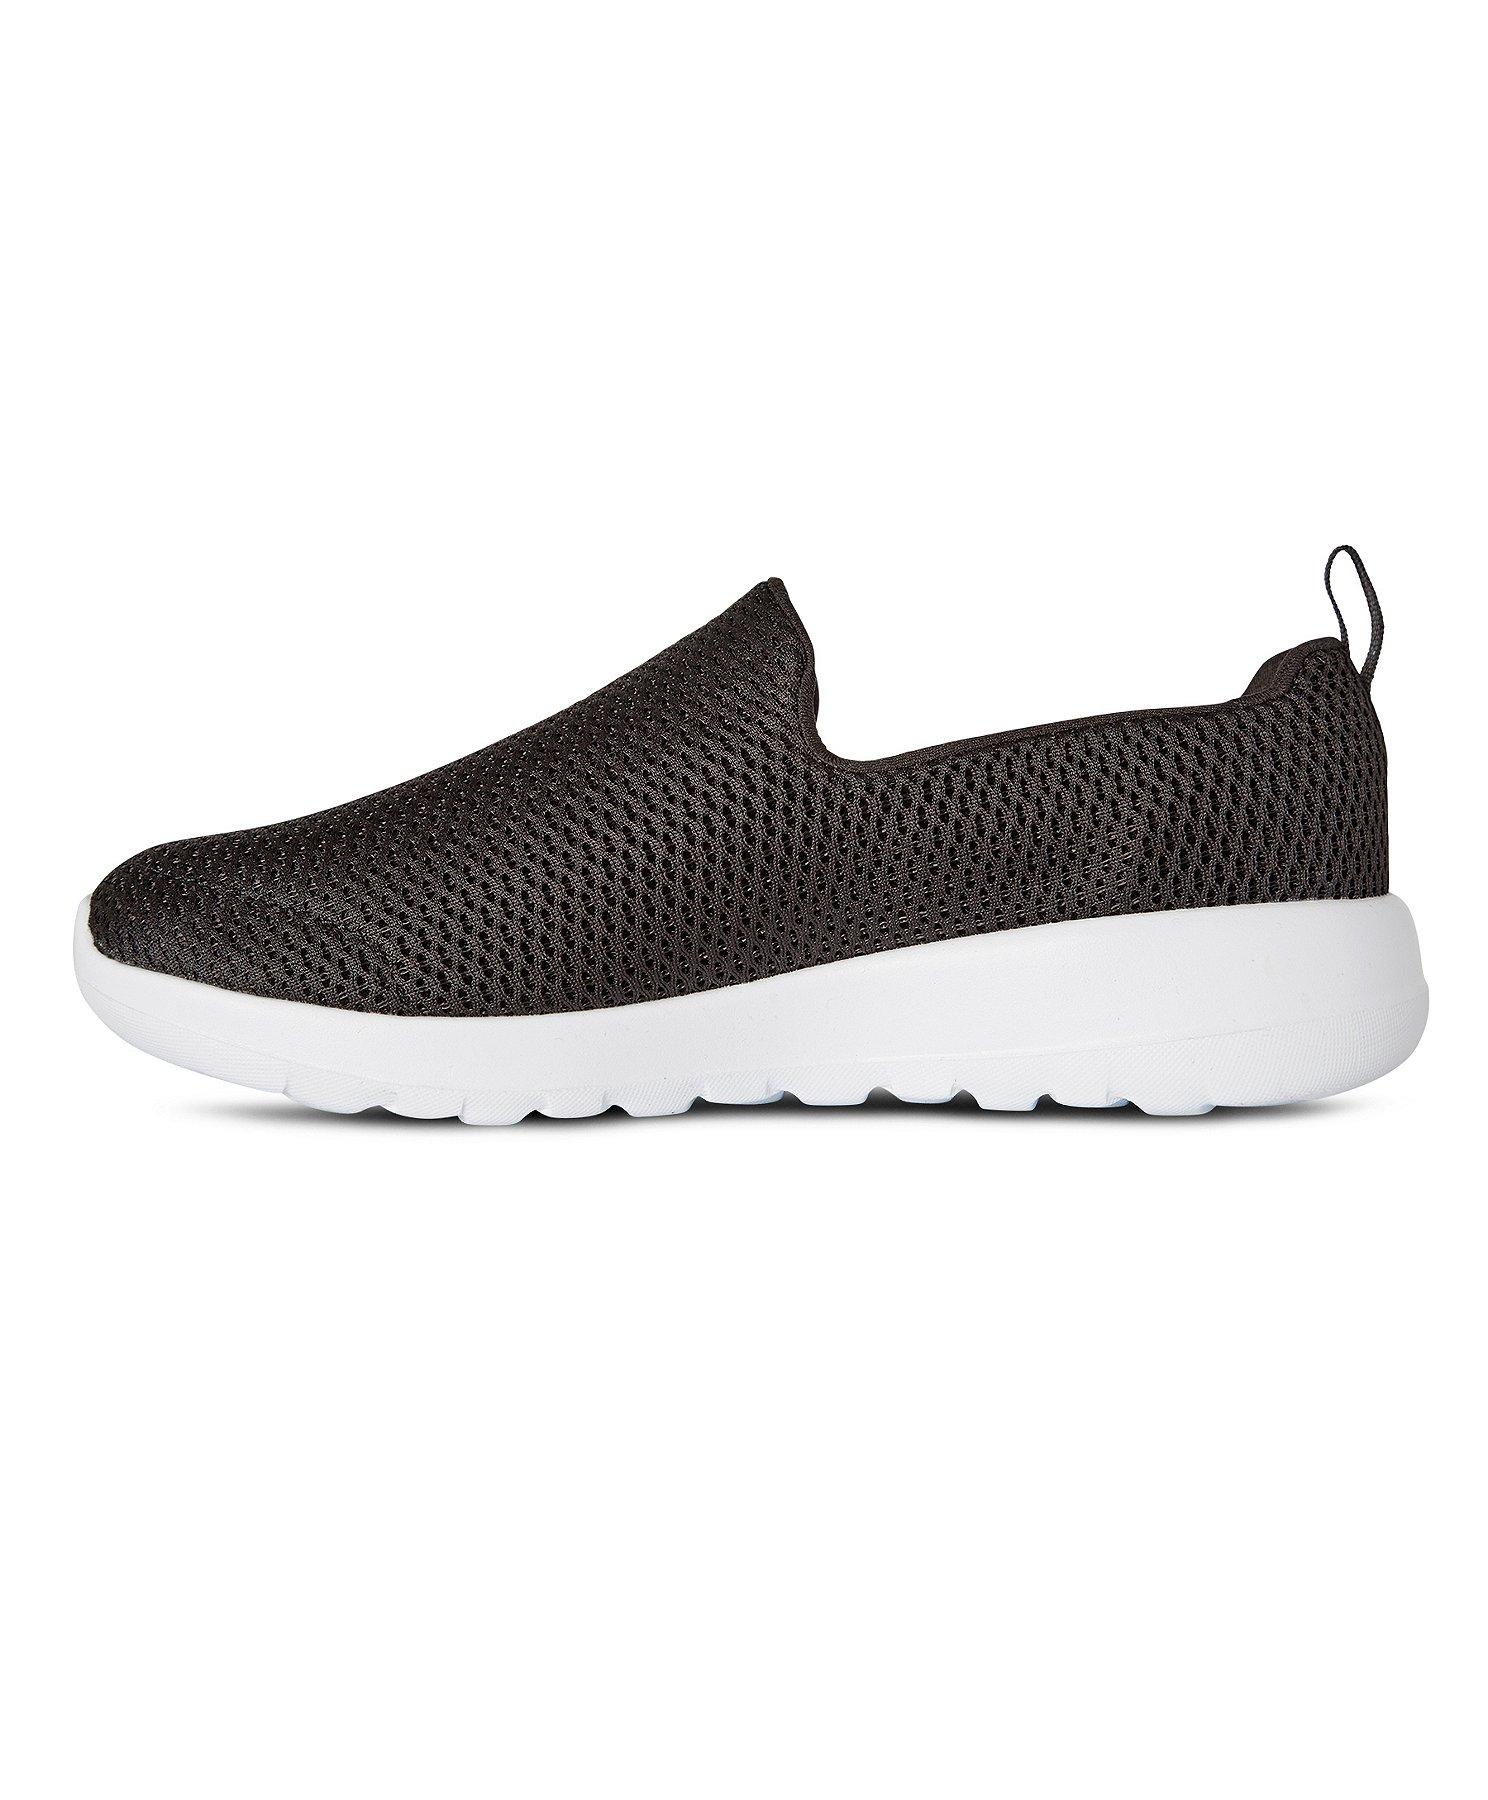 skechers joy chaussures